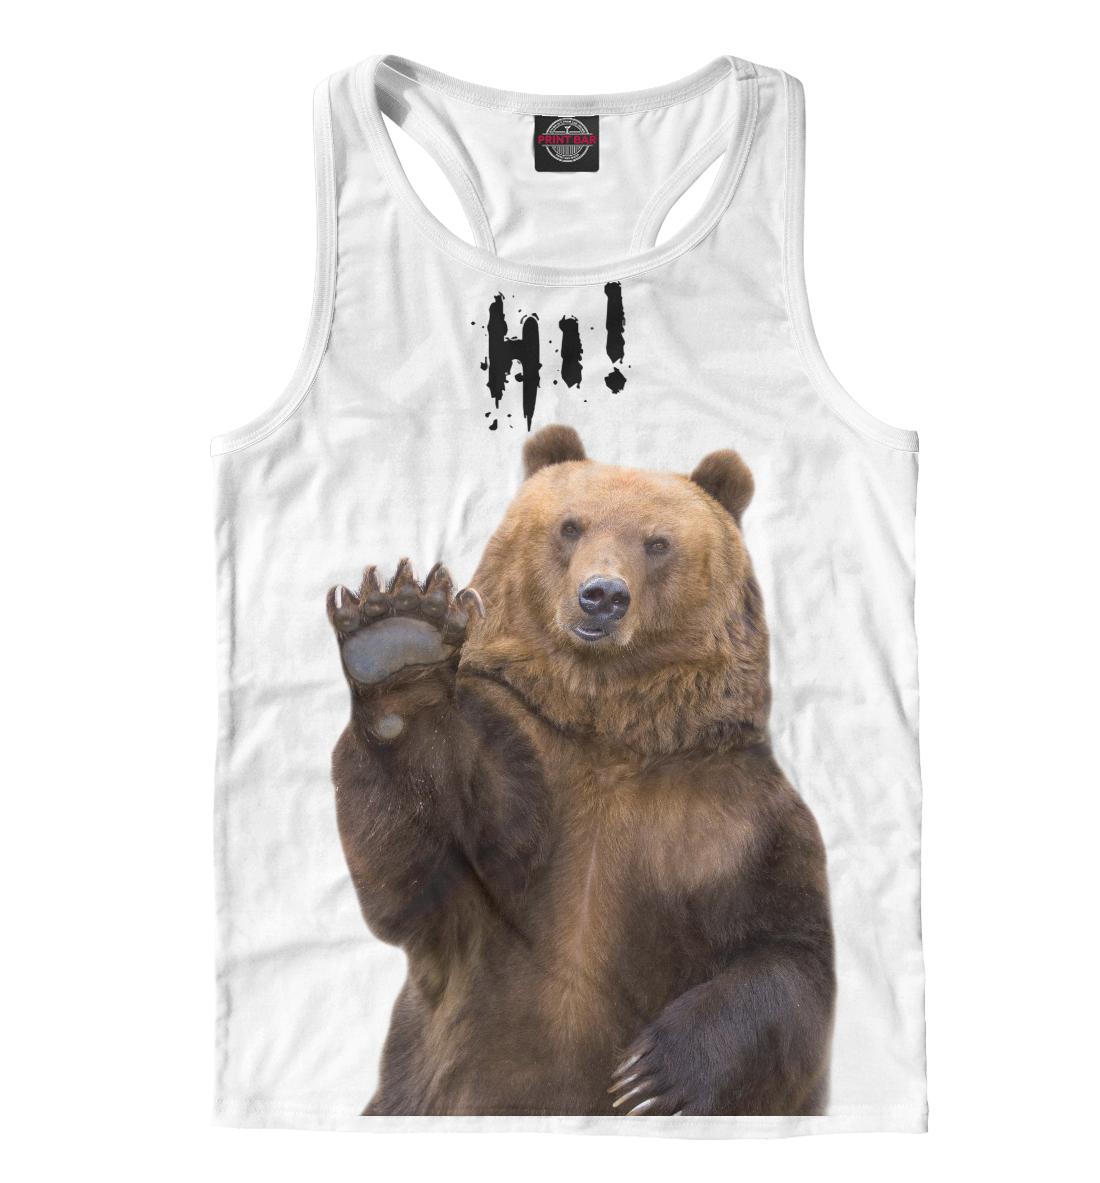 Купить Русский медведь, Printbar, Майки борцовки, MED-125308-mayb-2